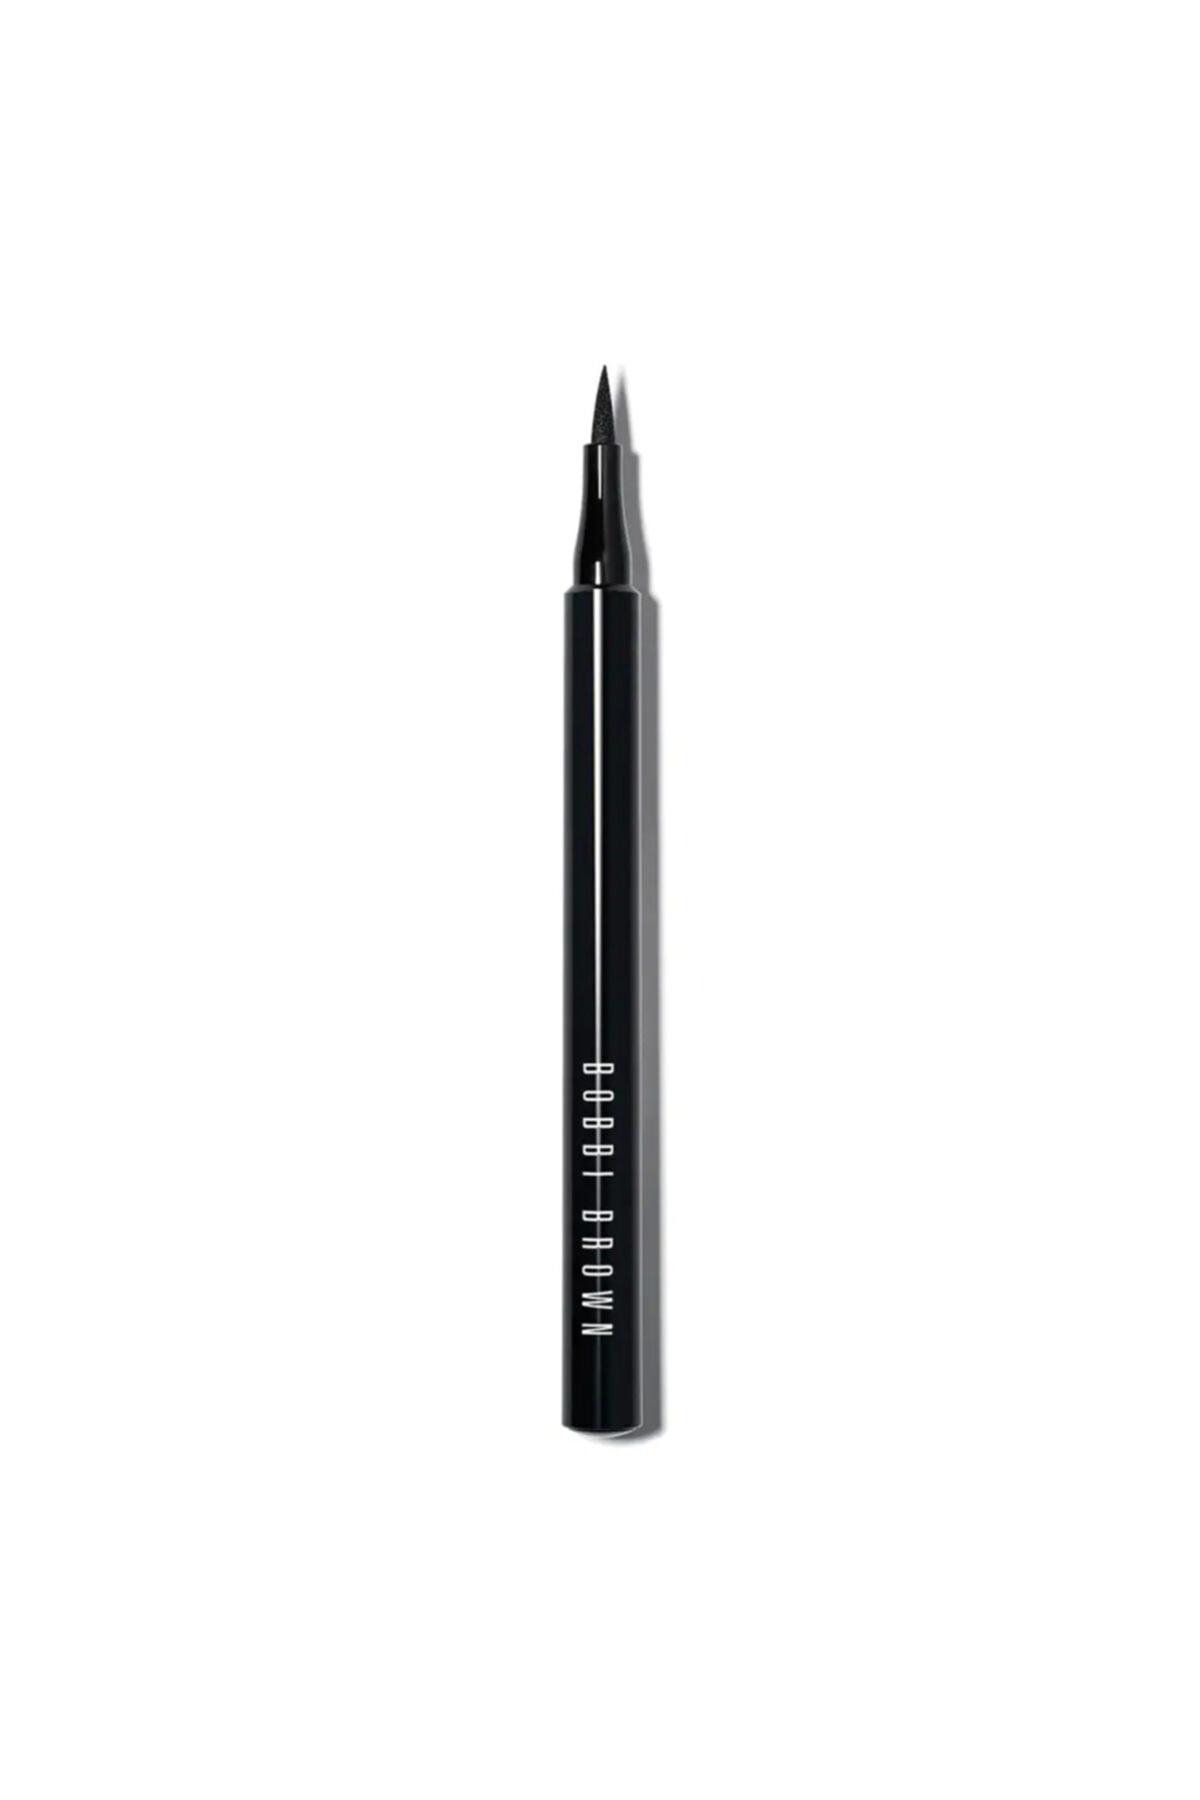 BOBBI BROWN Likit Siyah Eyeliner - Ink Liner Blackest Black 05 ml 716170118574 1